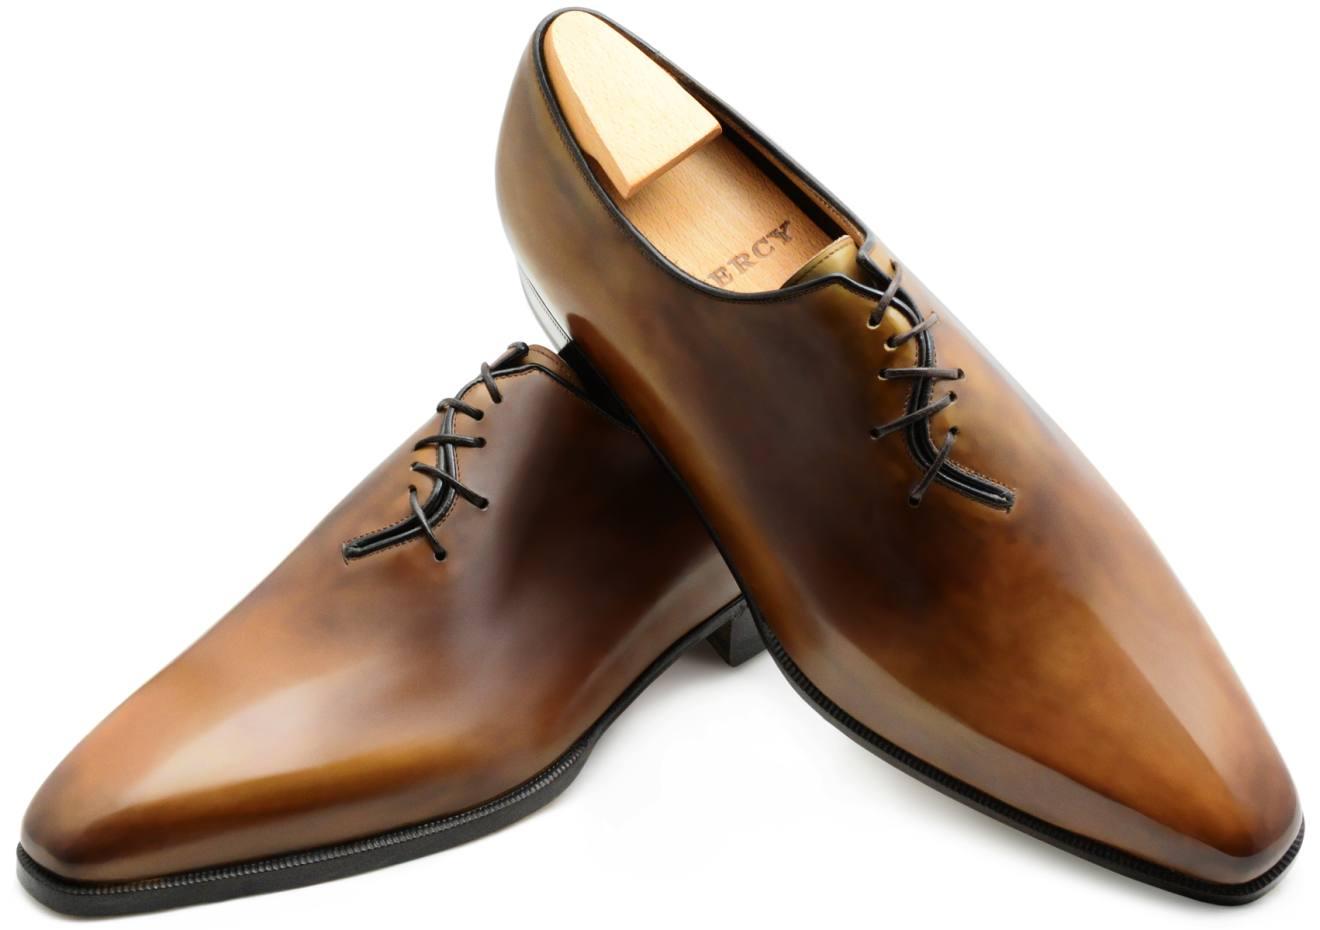 Aubercy box-calf Ellipse shoes, €1,550